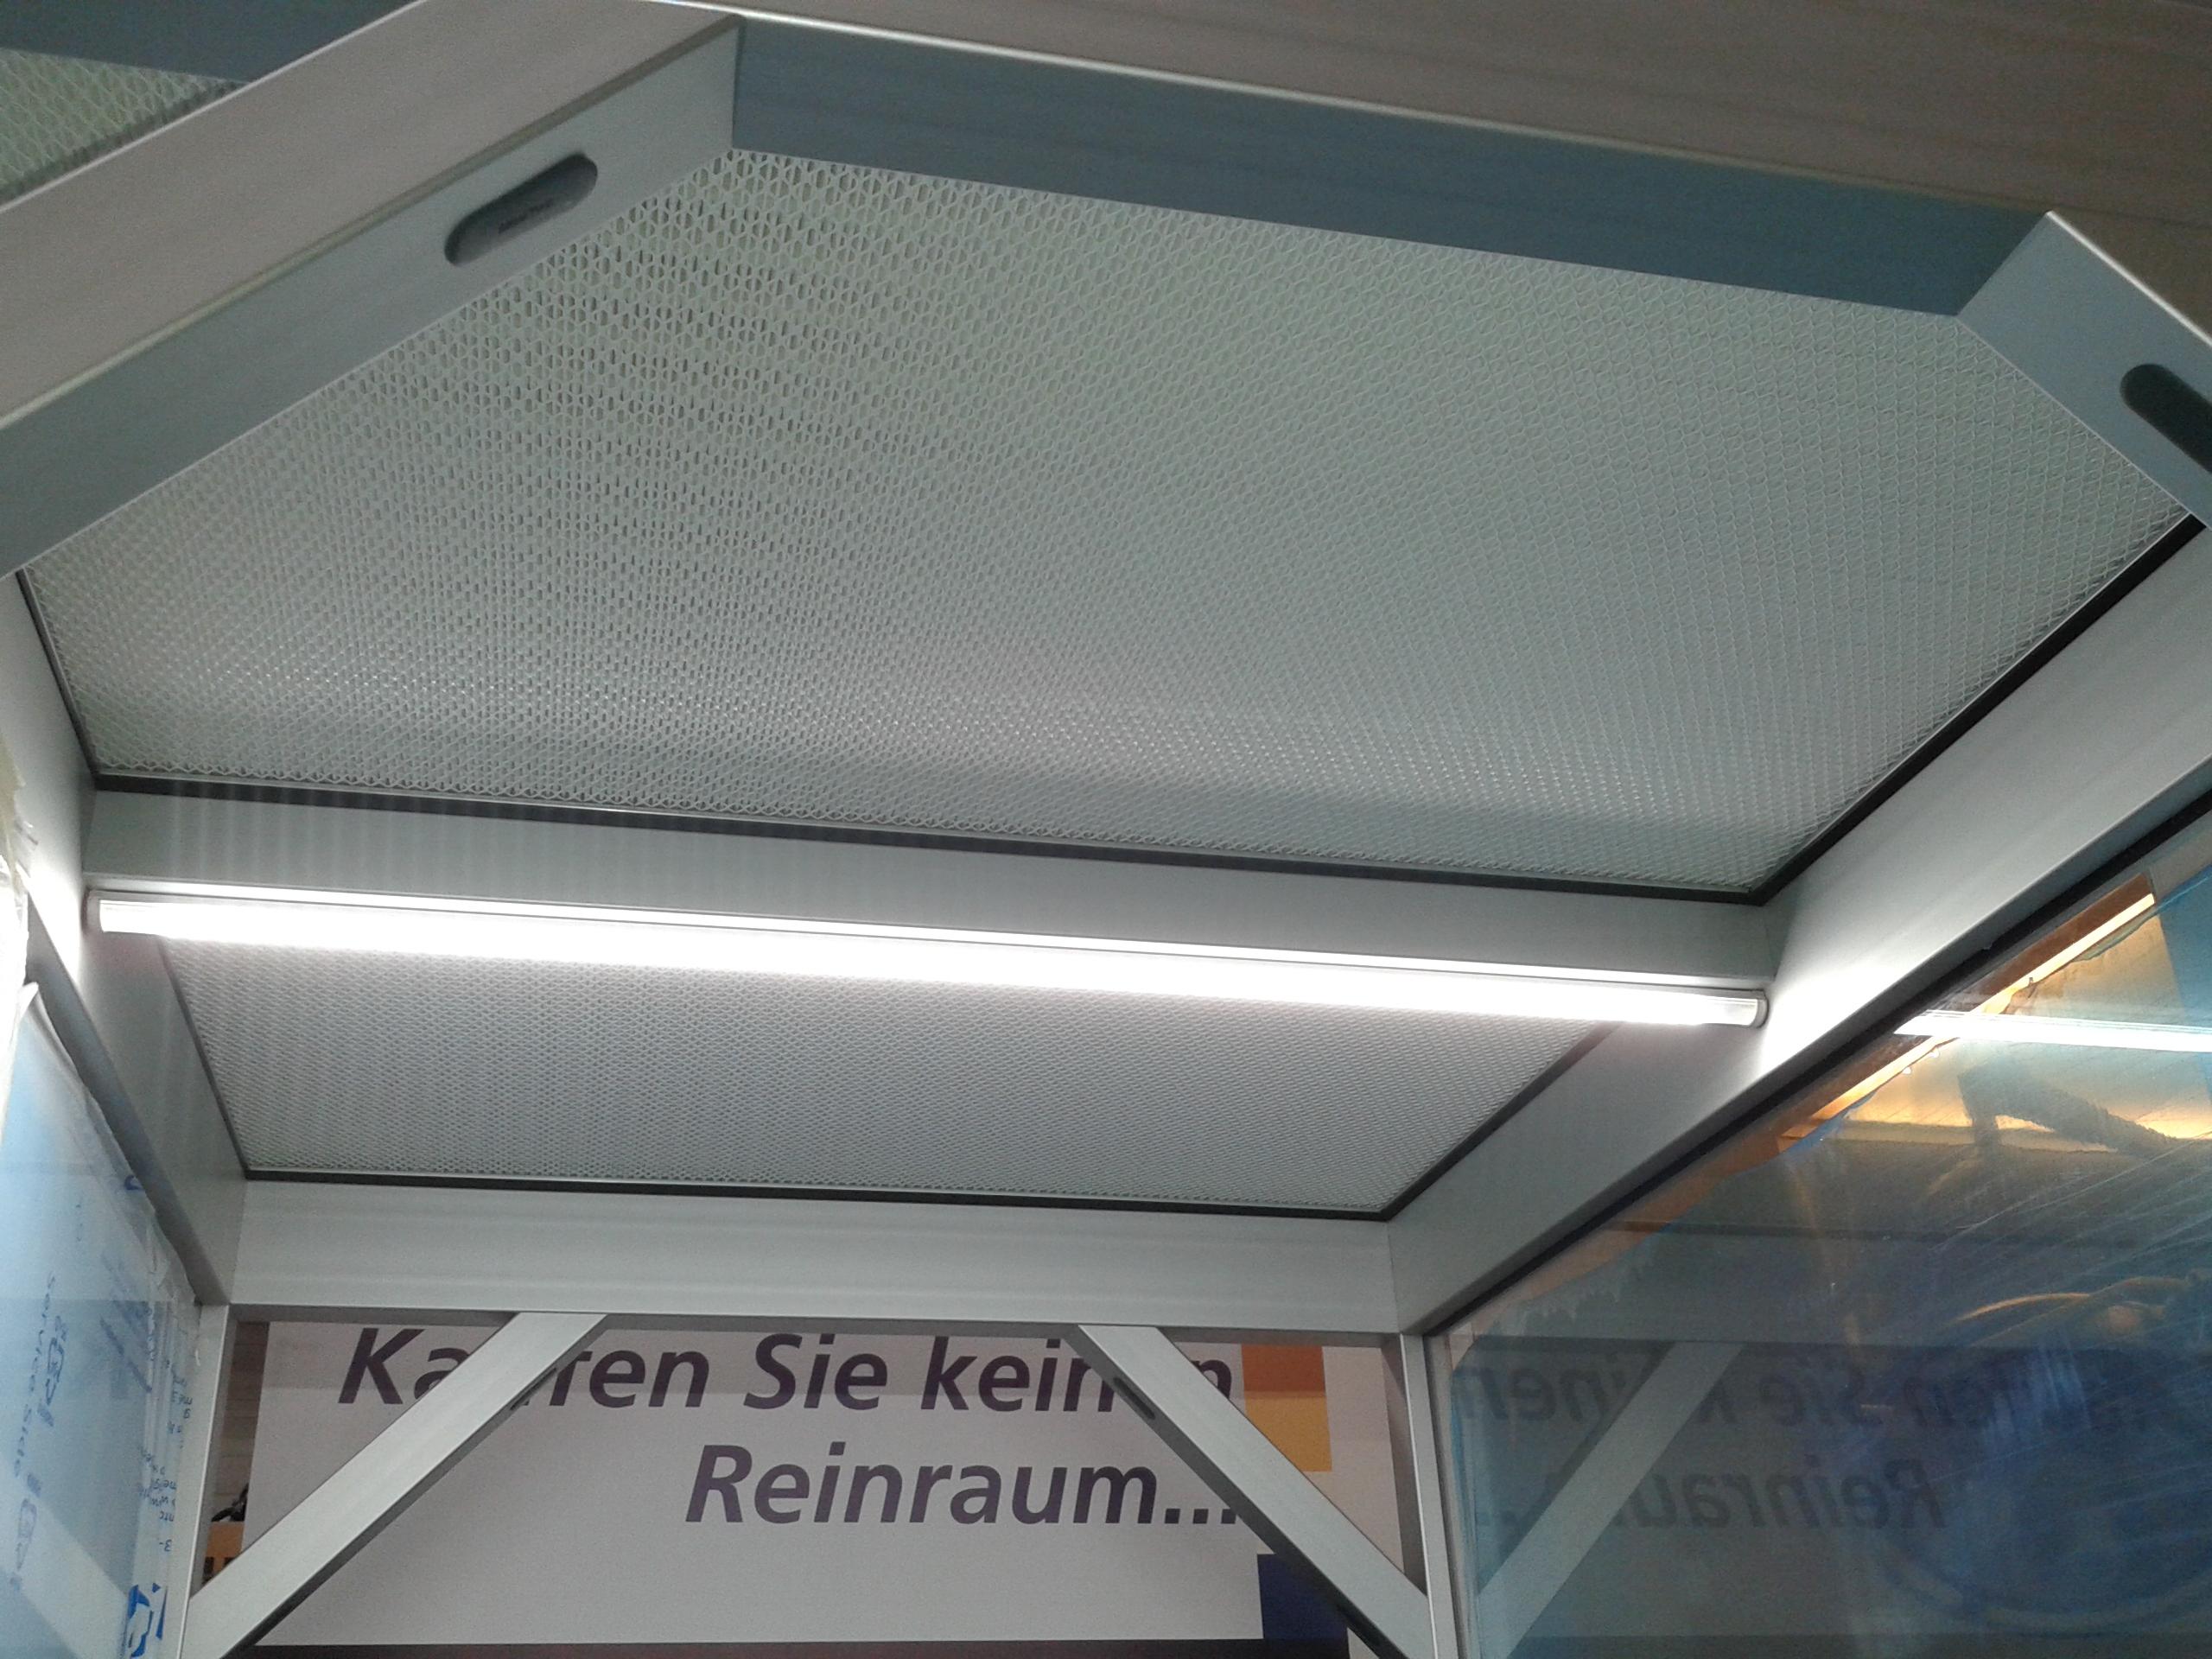 Reinraumbörse_Reinraumkabine_2